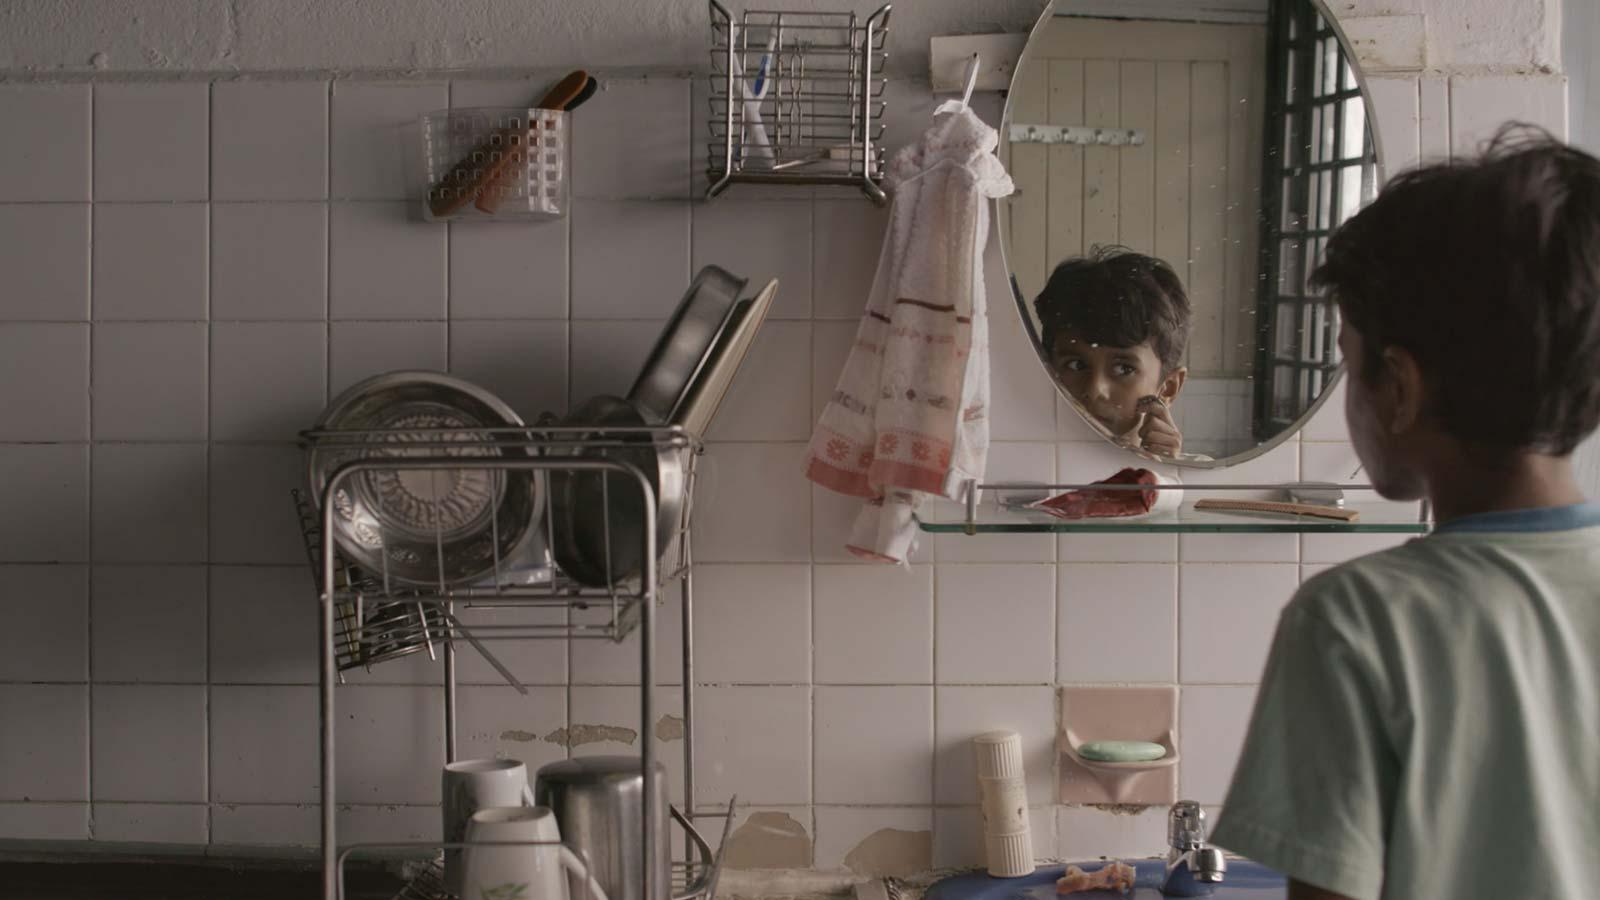 Tamil short film The Smell of Coffee by Nishok Nishok premiered at the International Short Film Festival Oberhausen. Photo courtesy: SGIFF